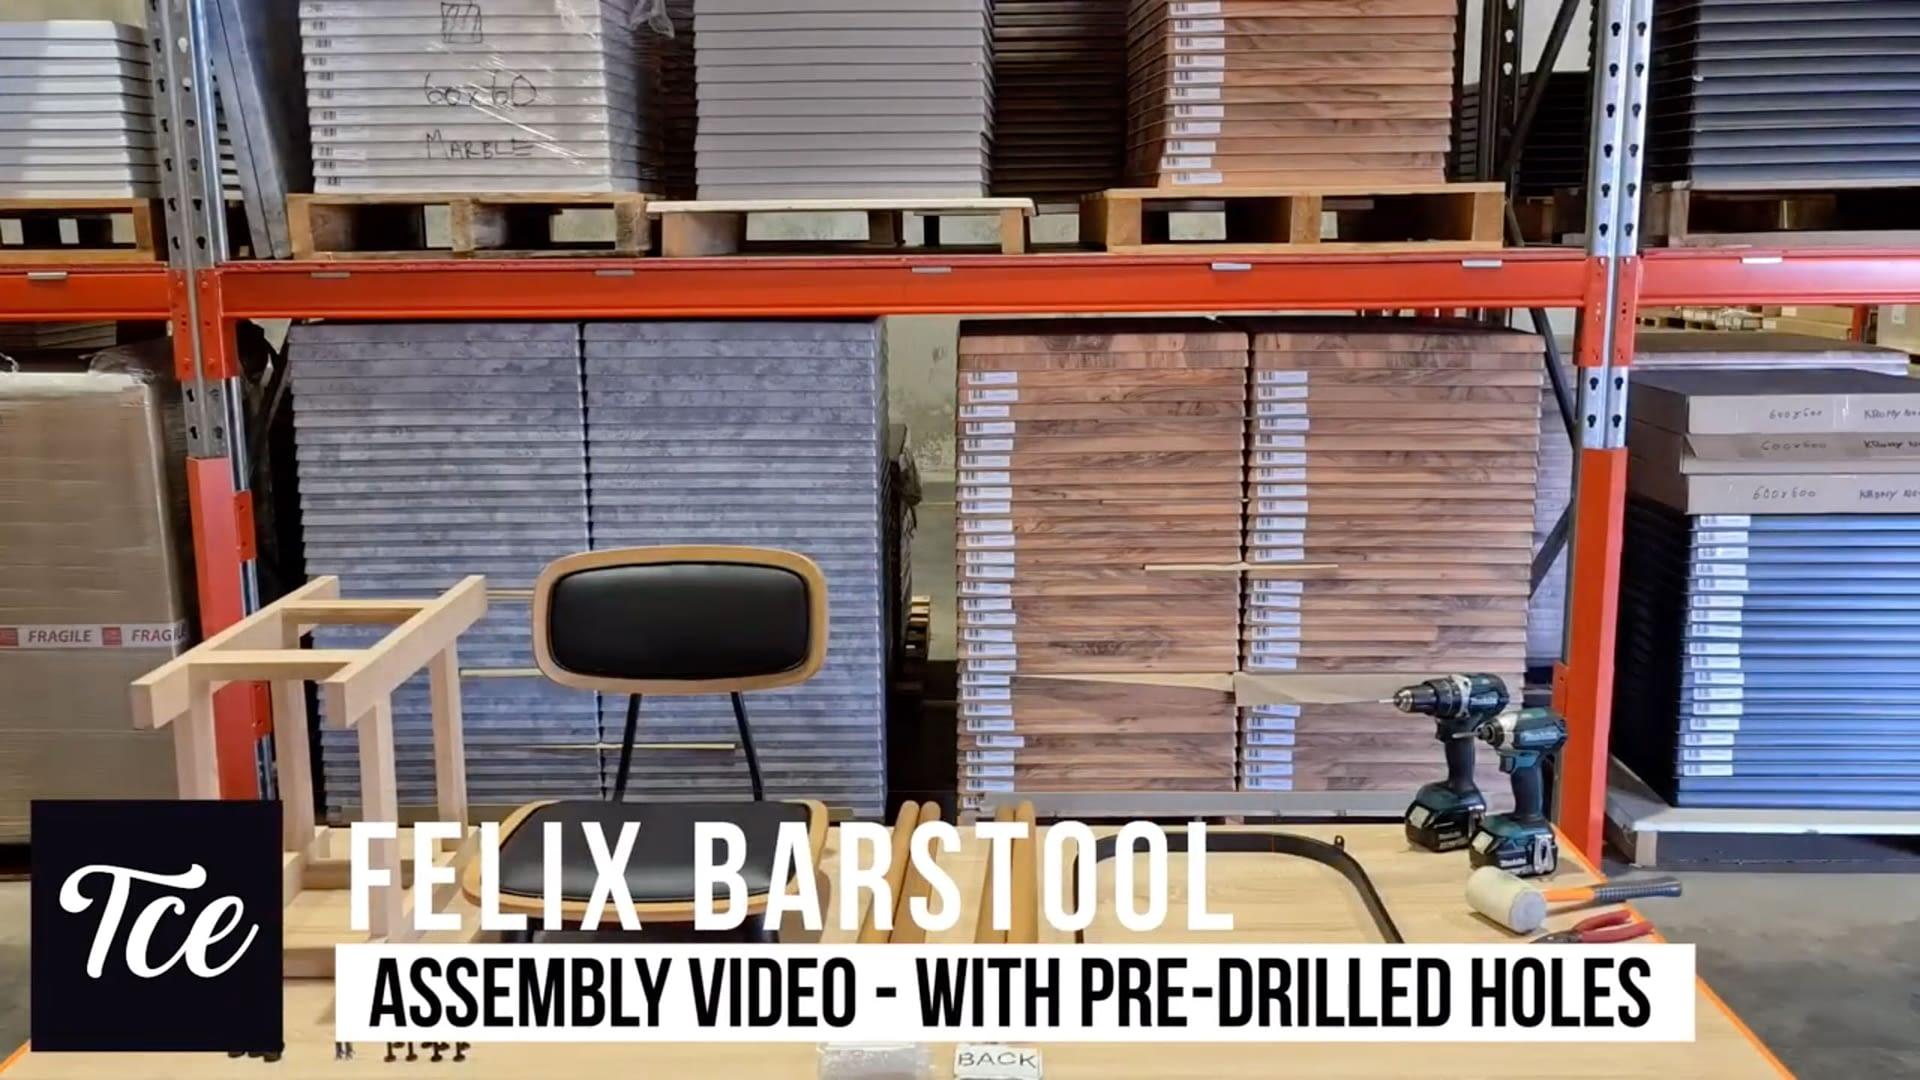 Assembly of the Felix Barstool